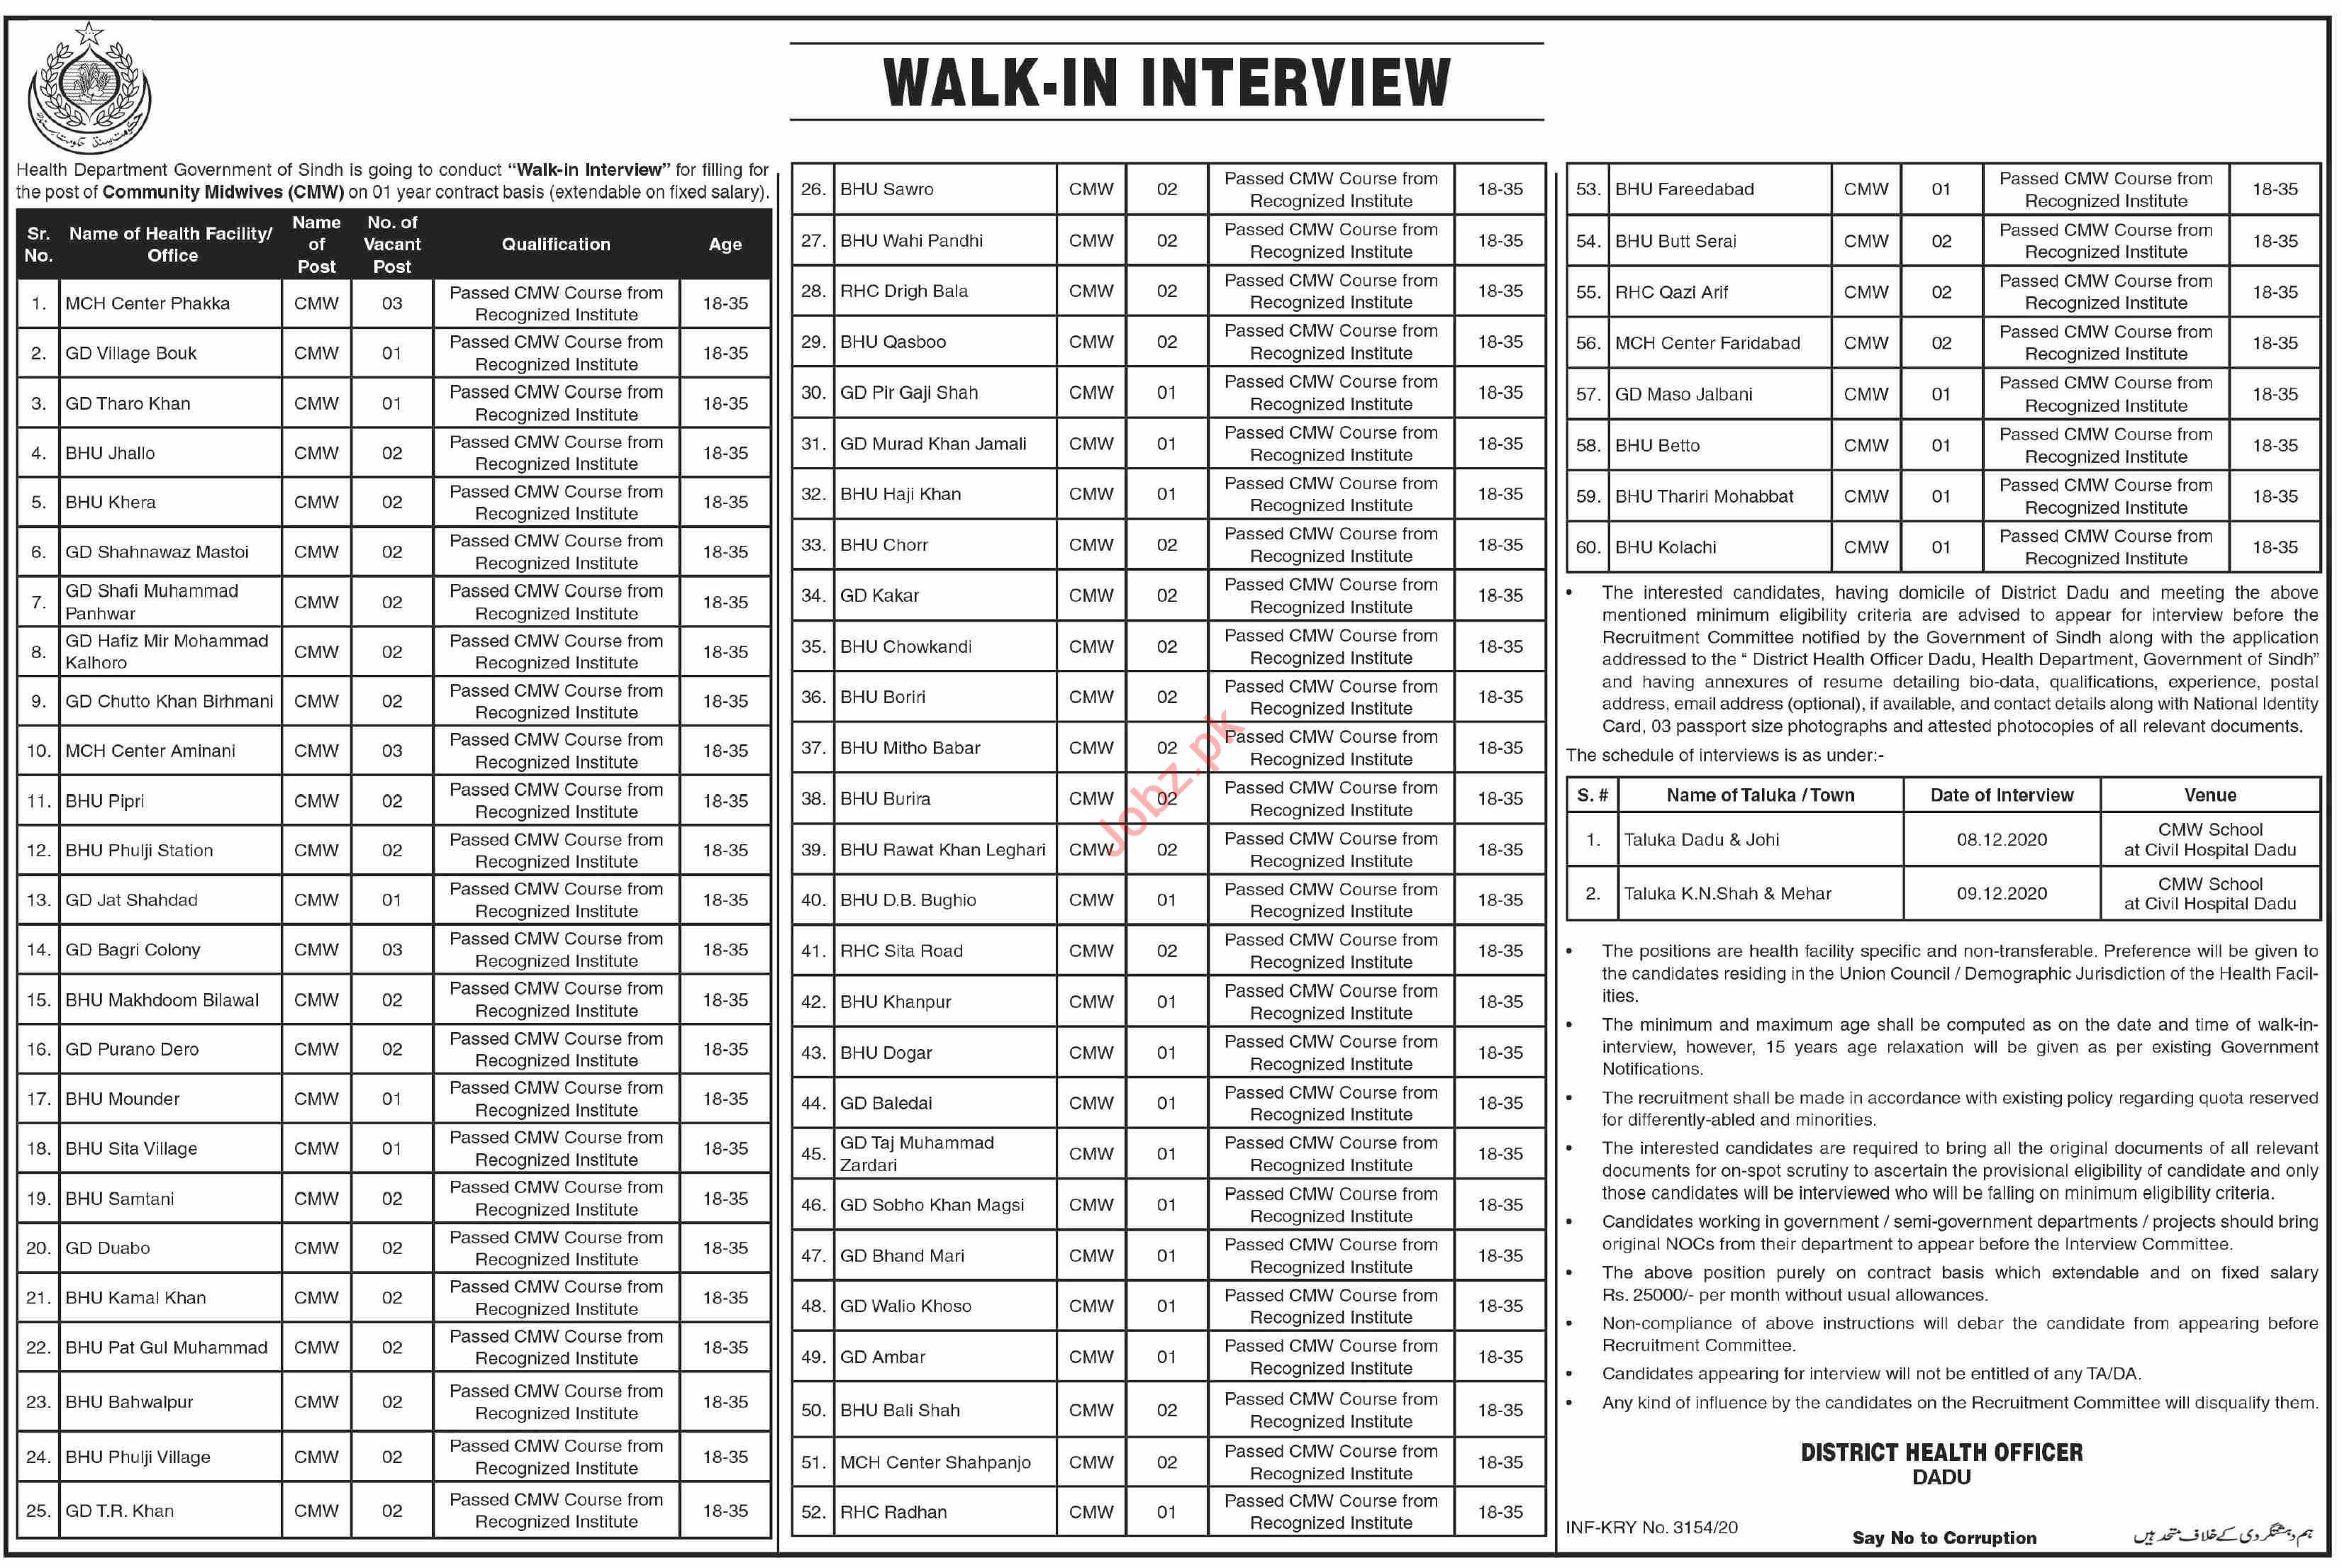 Health Department Dadu Jobs Interview 2020 for CMWs